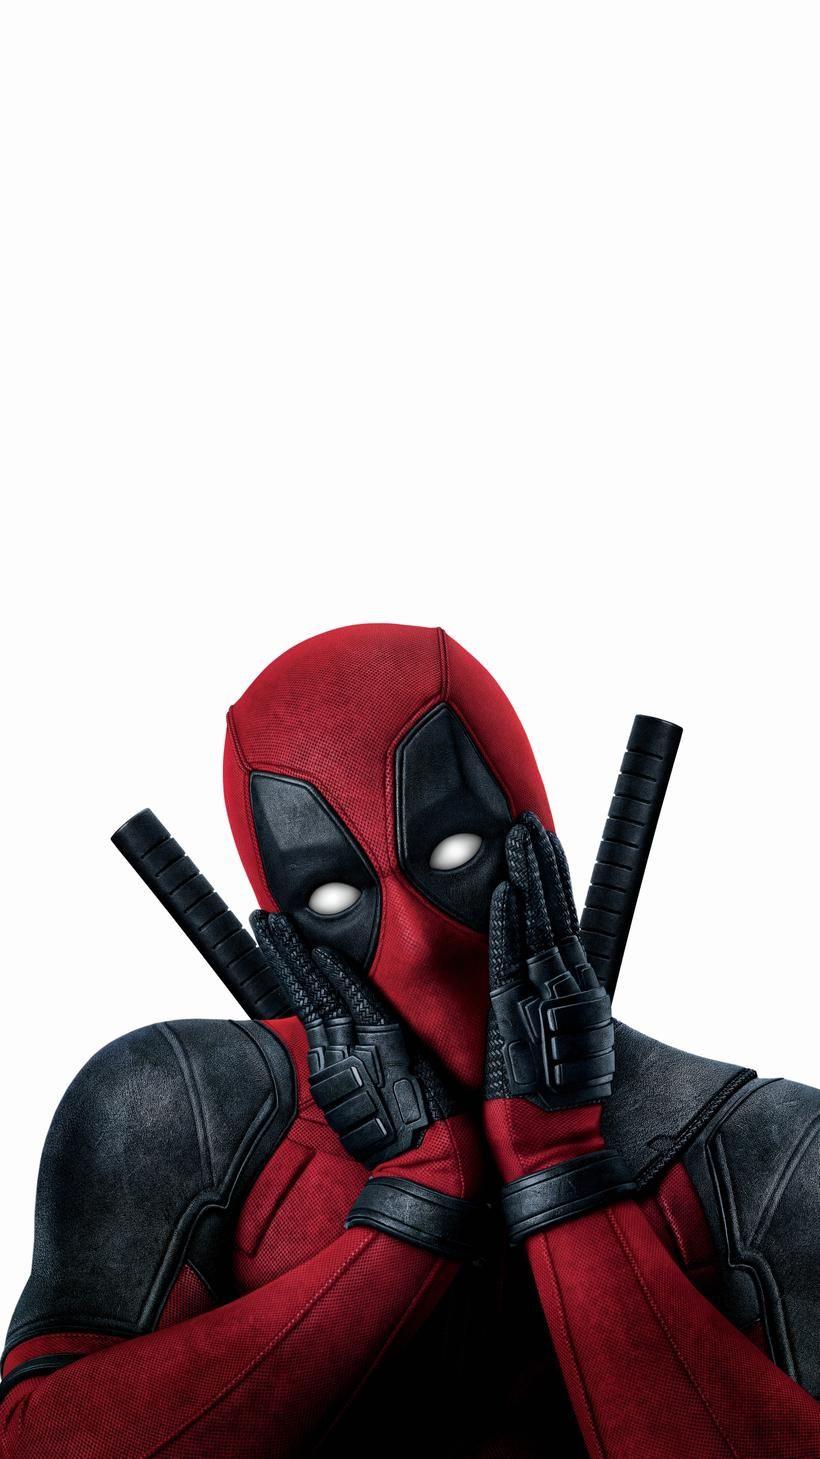 Avengers Infinity War 2018 Phone Wallpaper Moviemania Deadpool And Spiderman Deadpool Wallpaper Deadpool Movie